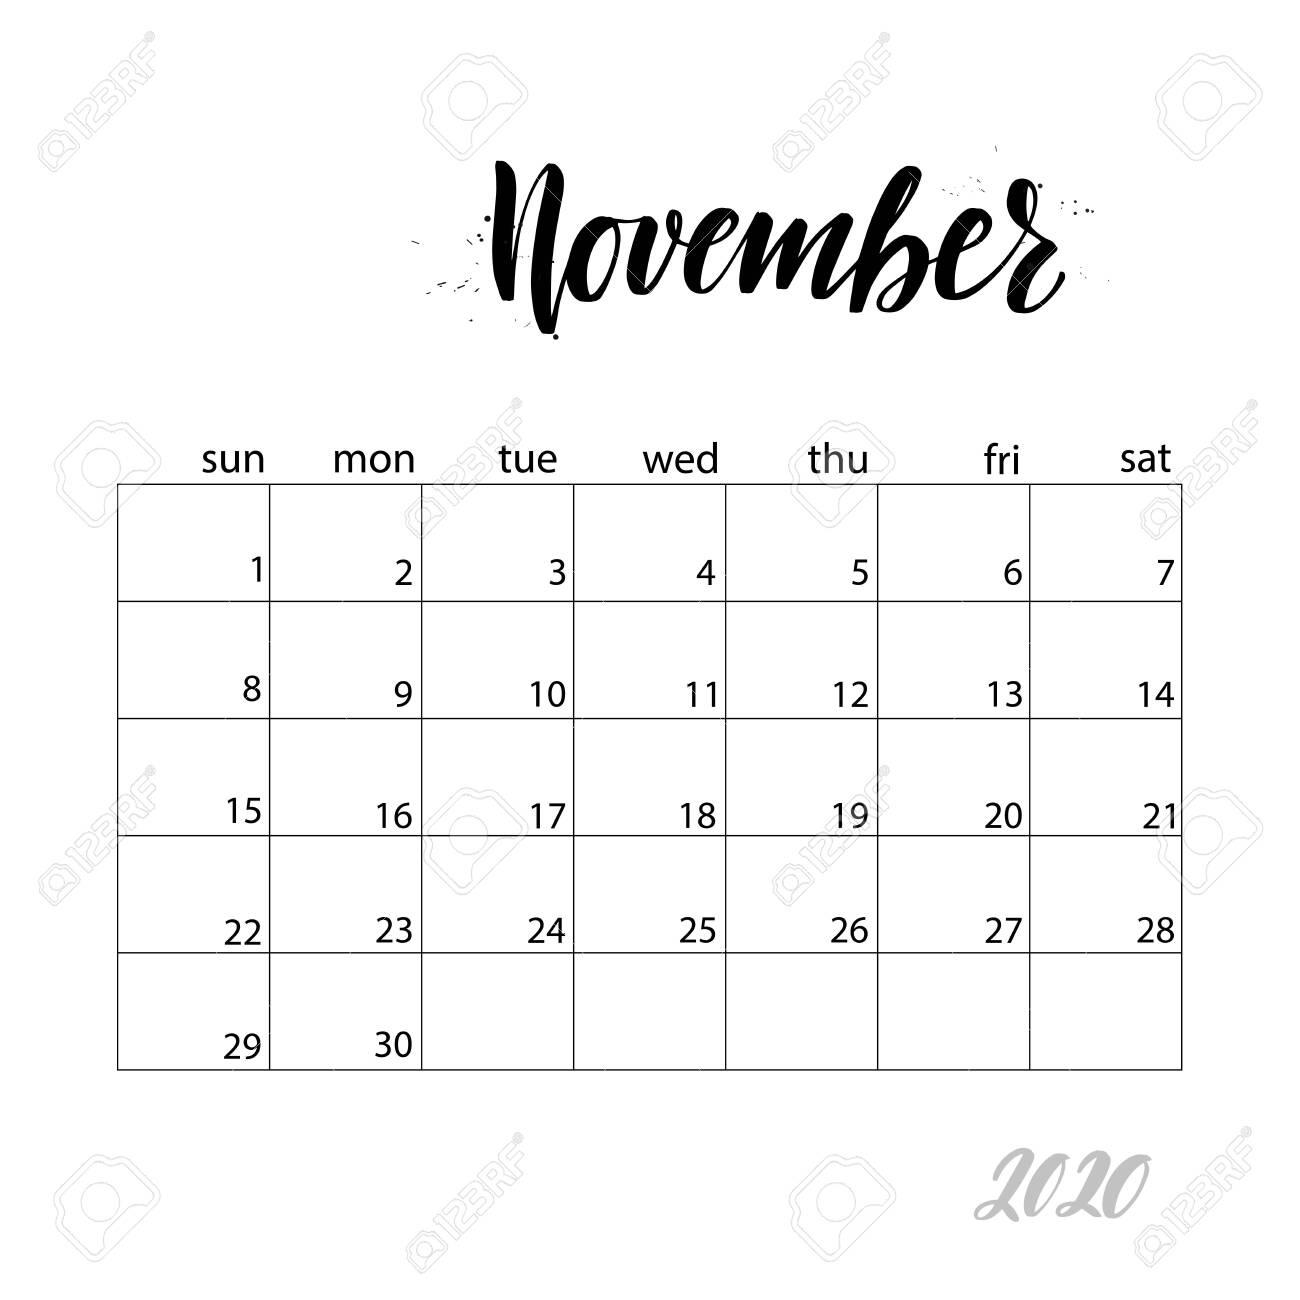 November. Monthly Calendar For 2020 Year. Handwritten Modern.. regarding Bring Up Calander For October And November 2020